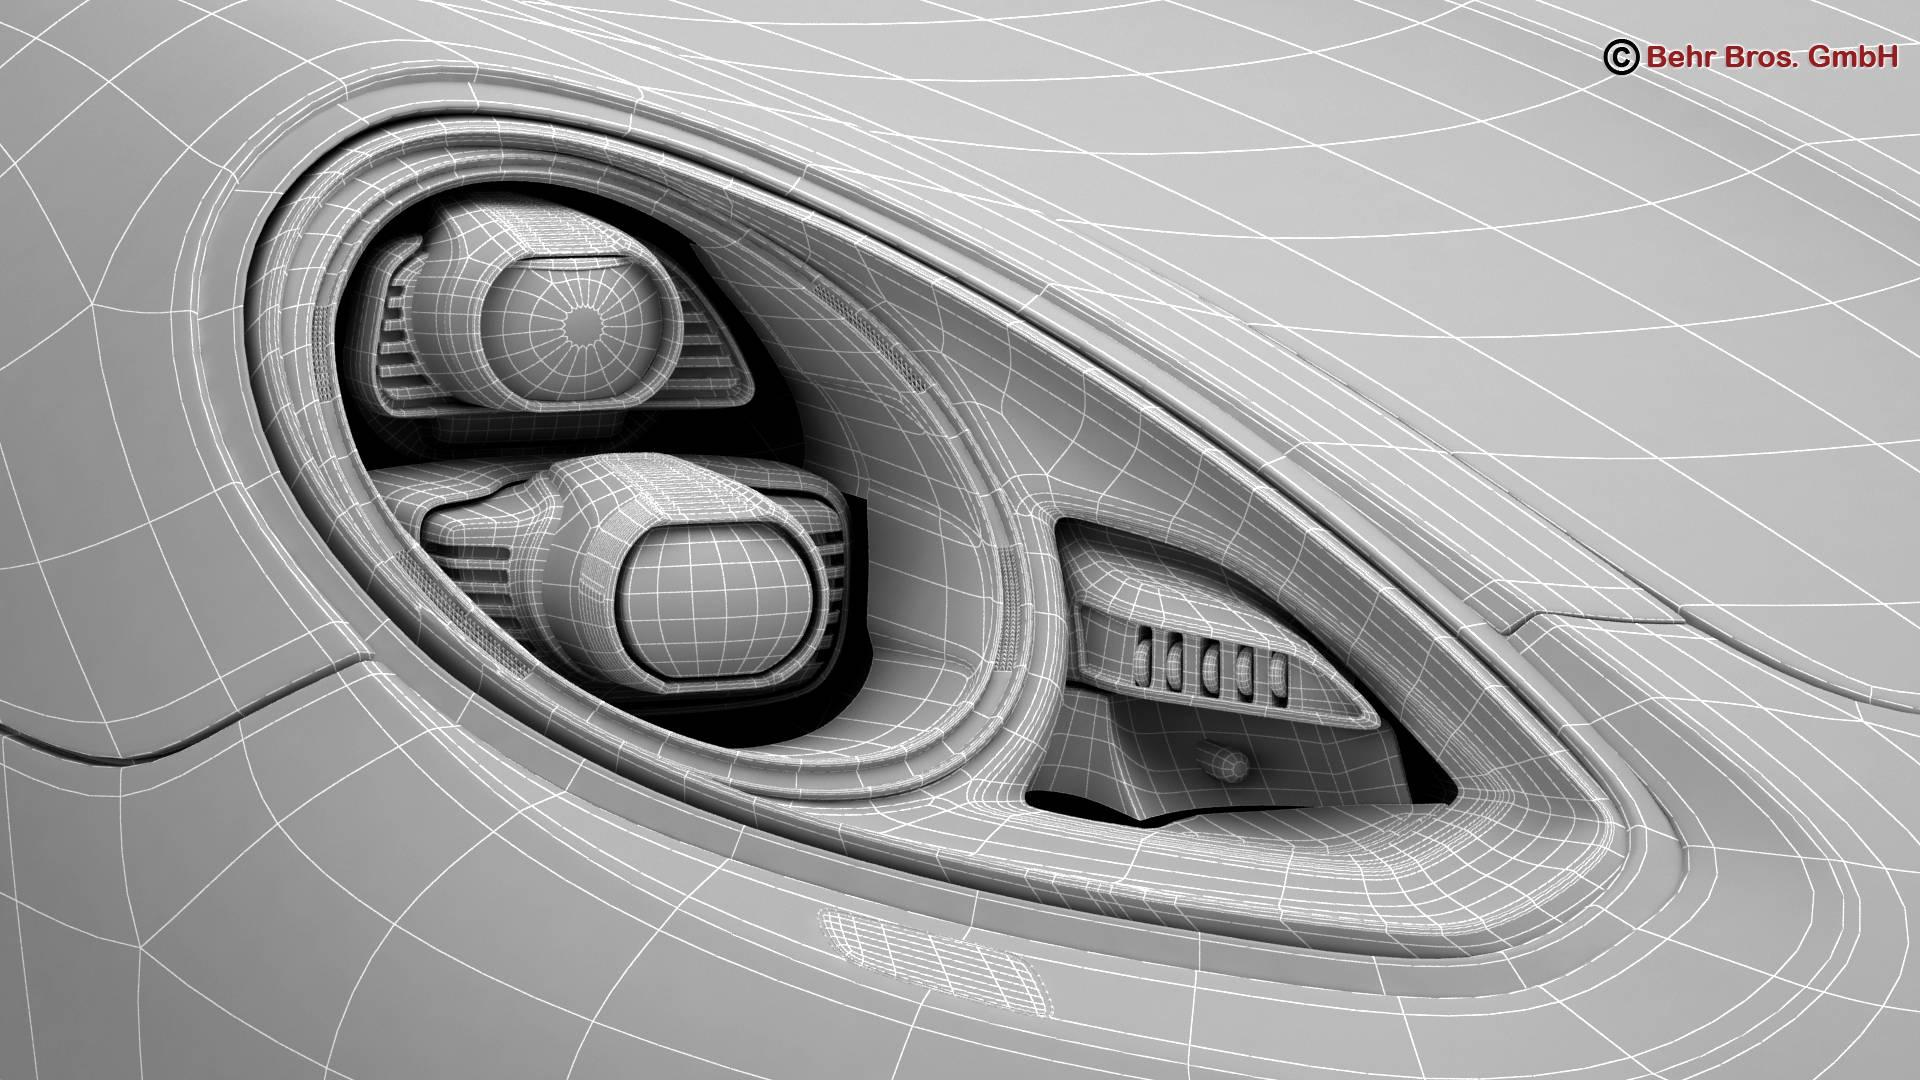 porsche panamera turbo s 2014 3d model 3ds max fbx c4d lwo ma mb obj 215084